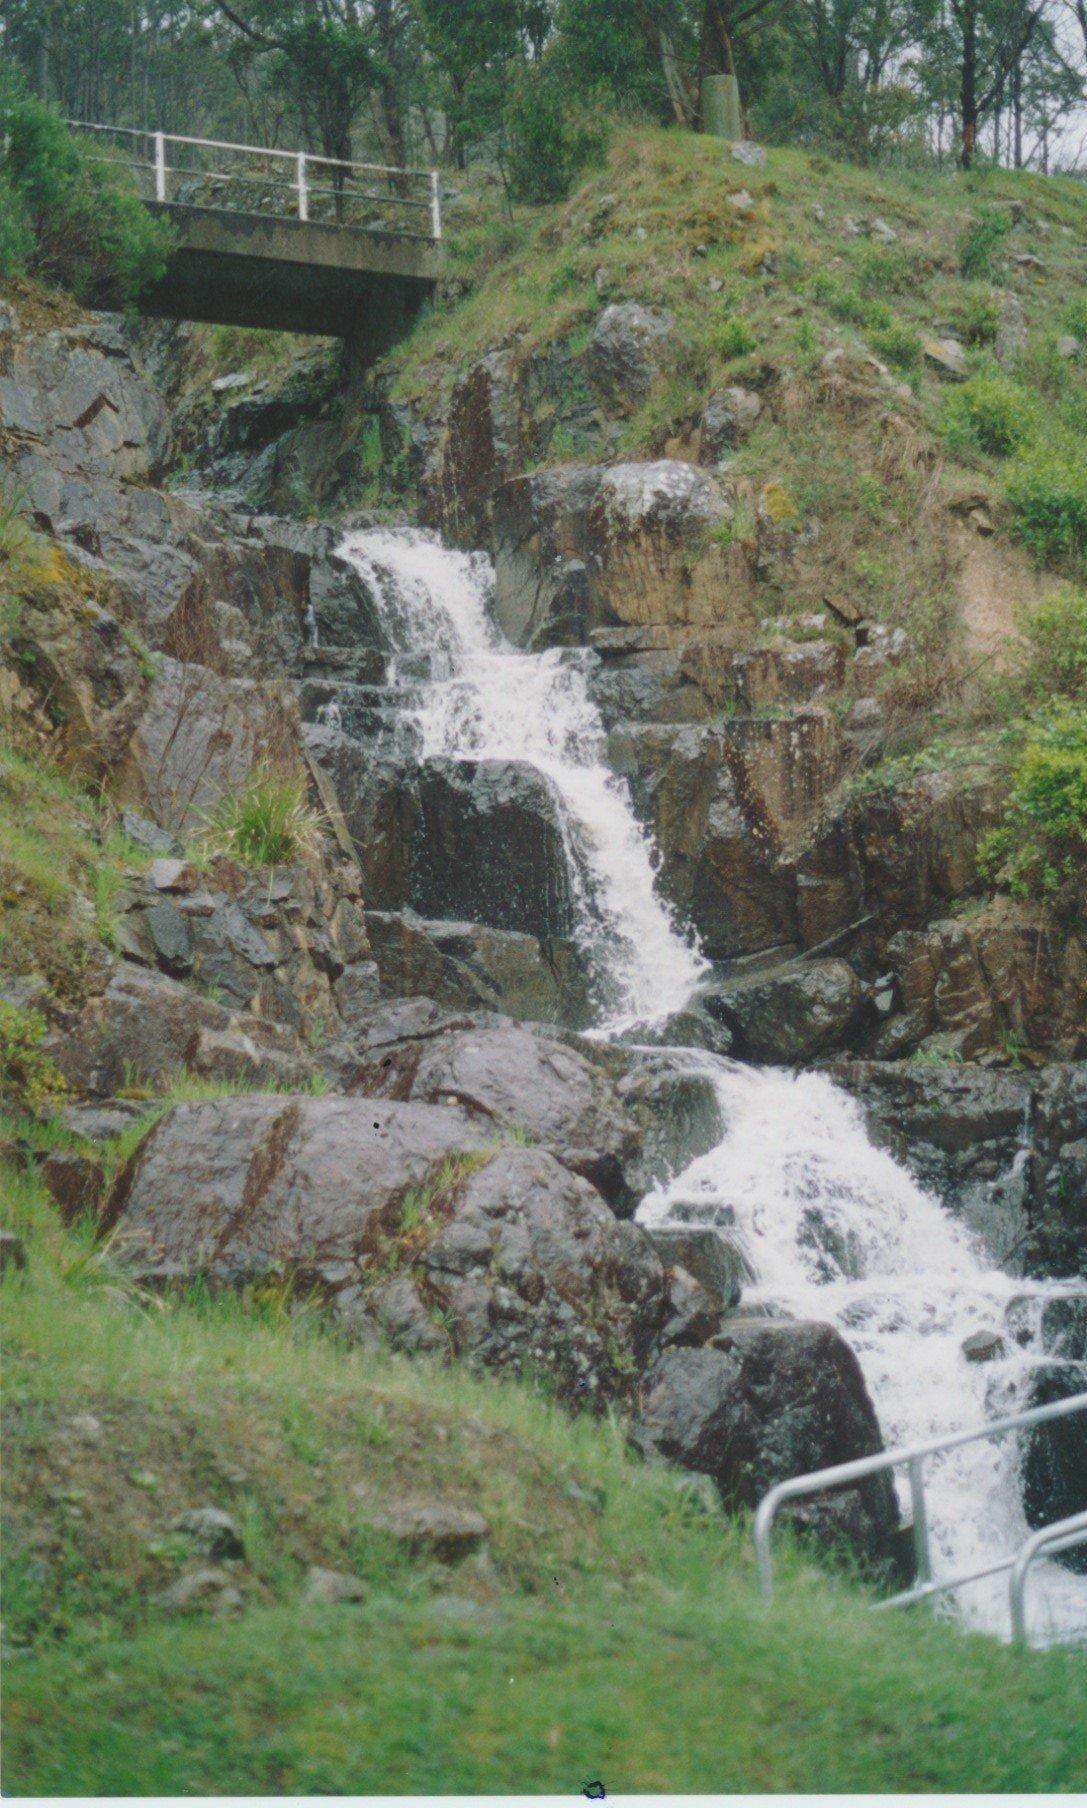 Cascade below overflow at Sugarloaf Reservoir.  Bruce G. Draper, 2003